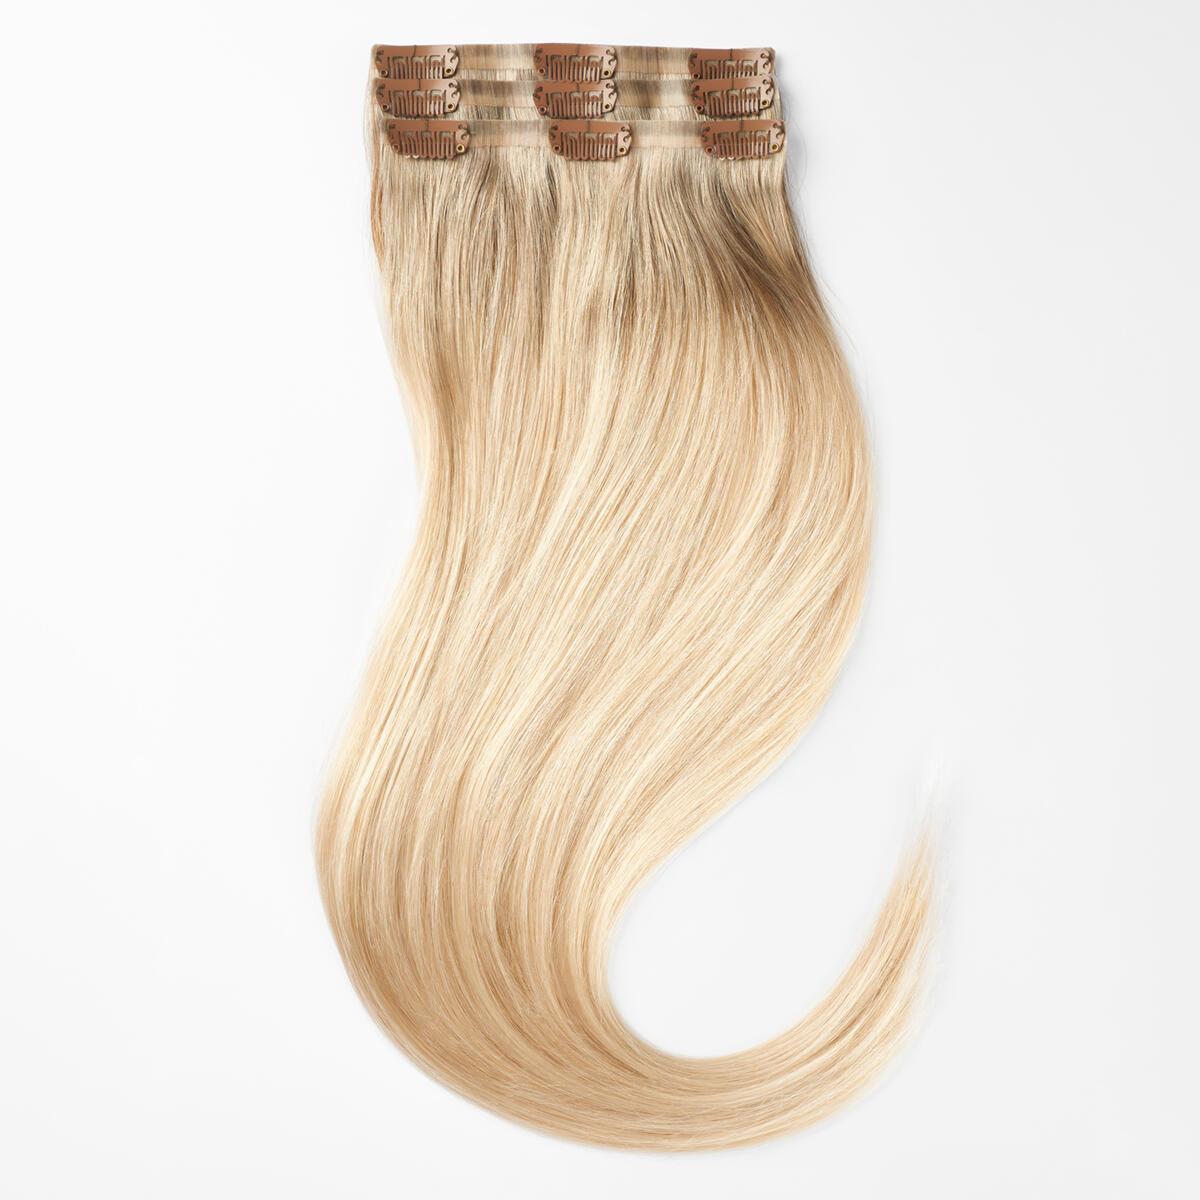 Sleek Clip-on set C2.2/10.5 Dark Cool Blonde ColorMelt 50 cm